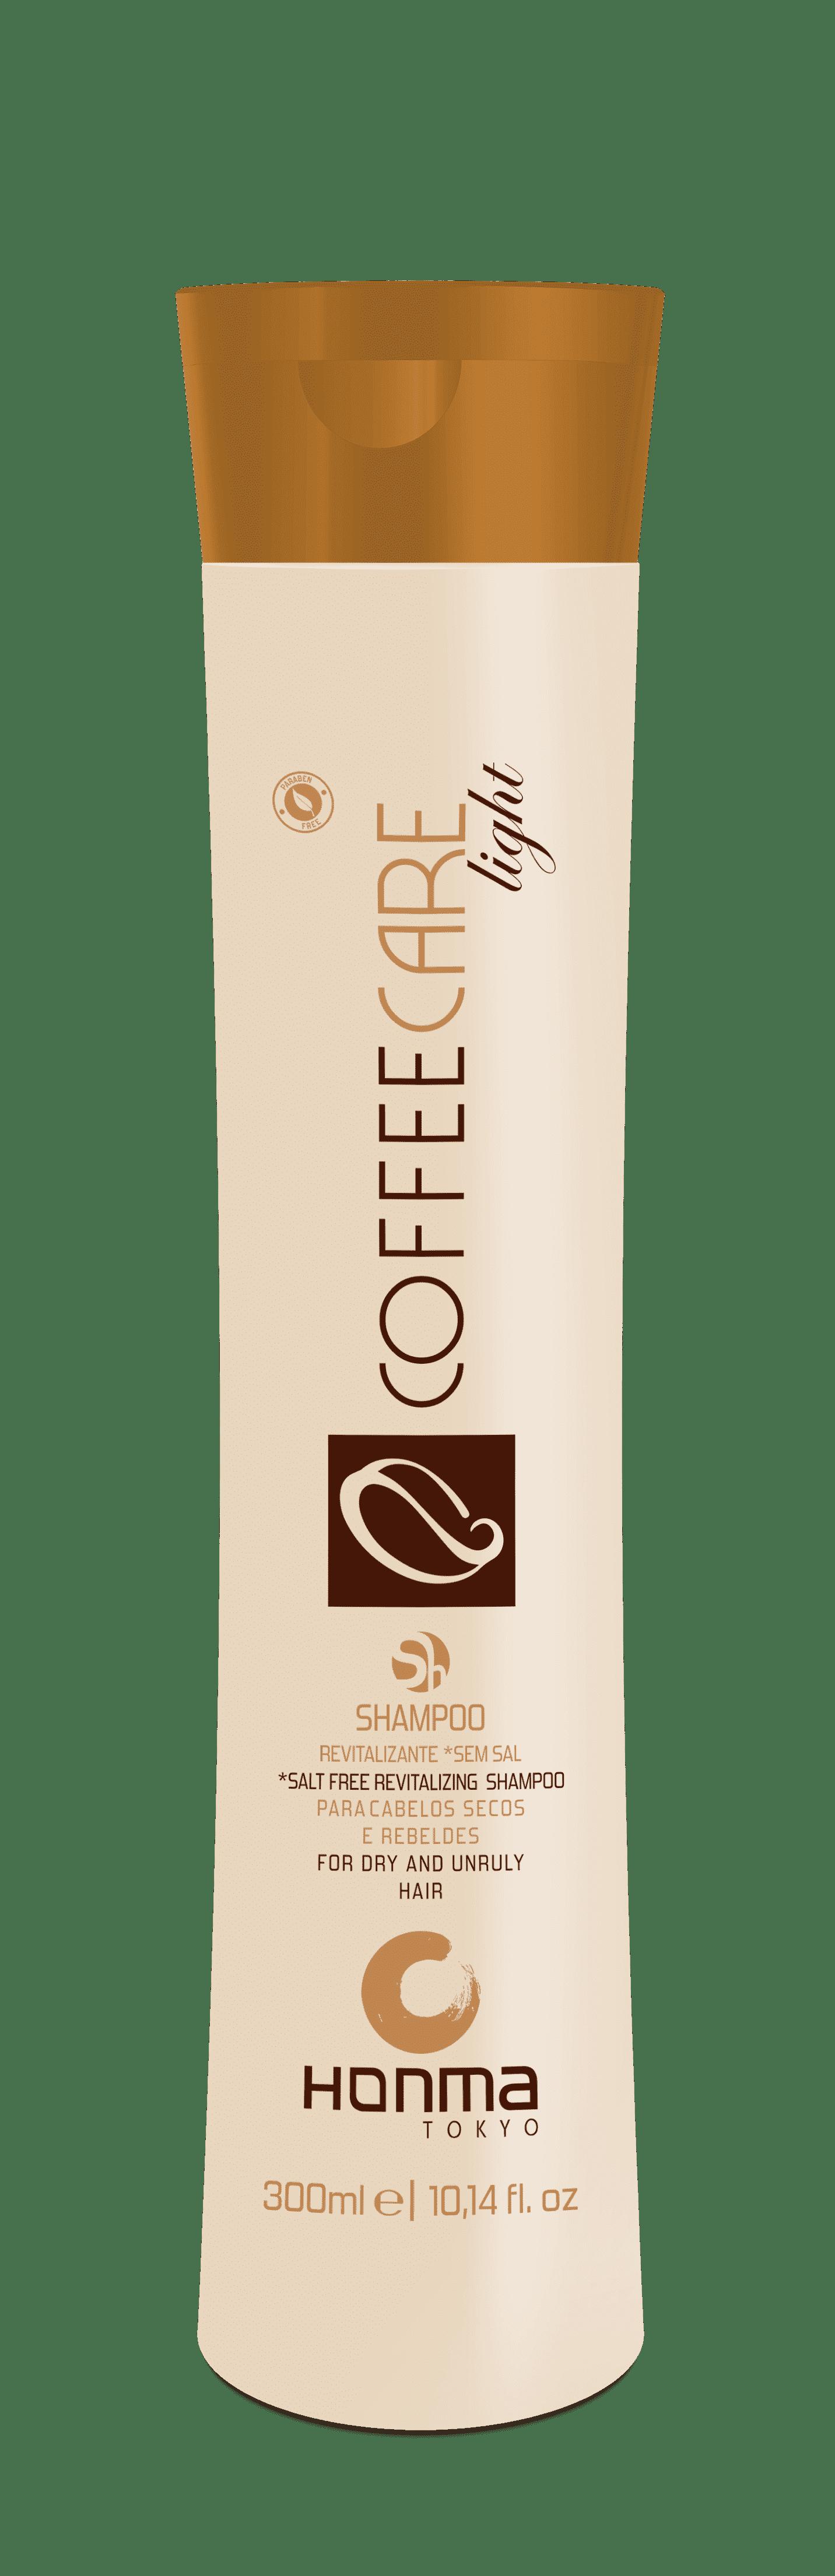 Honma Tokyo Coffee Care Light Бессолевой восстанавливающий шампунь питание и укрепление, 300 мл, 1000 мл honma tokyo кератин шаг 2 линии coffee premium all liss шаг 2 линии coffee premium all liss 500 мл